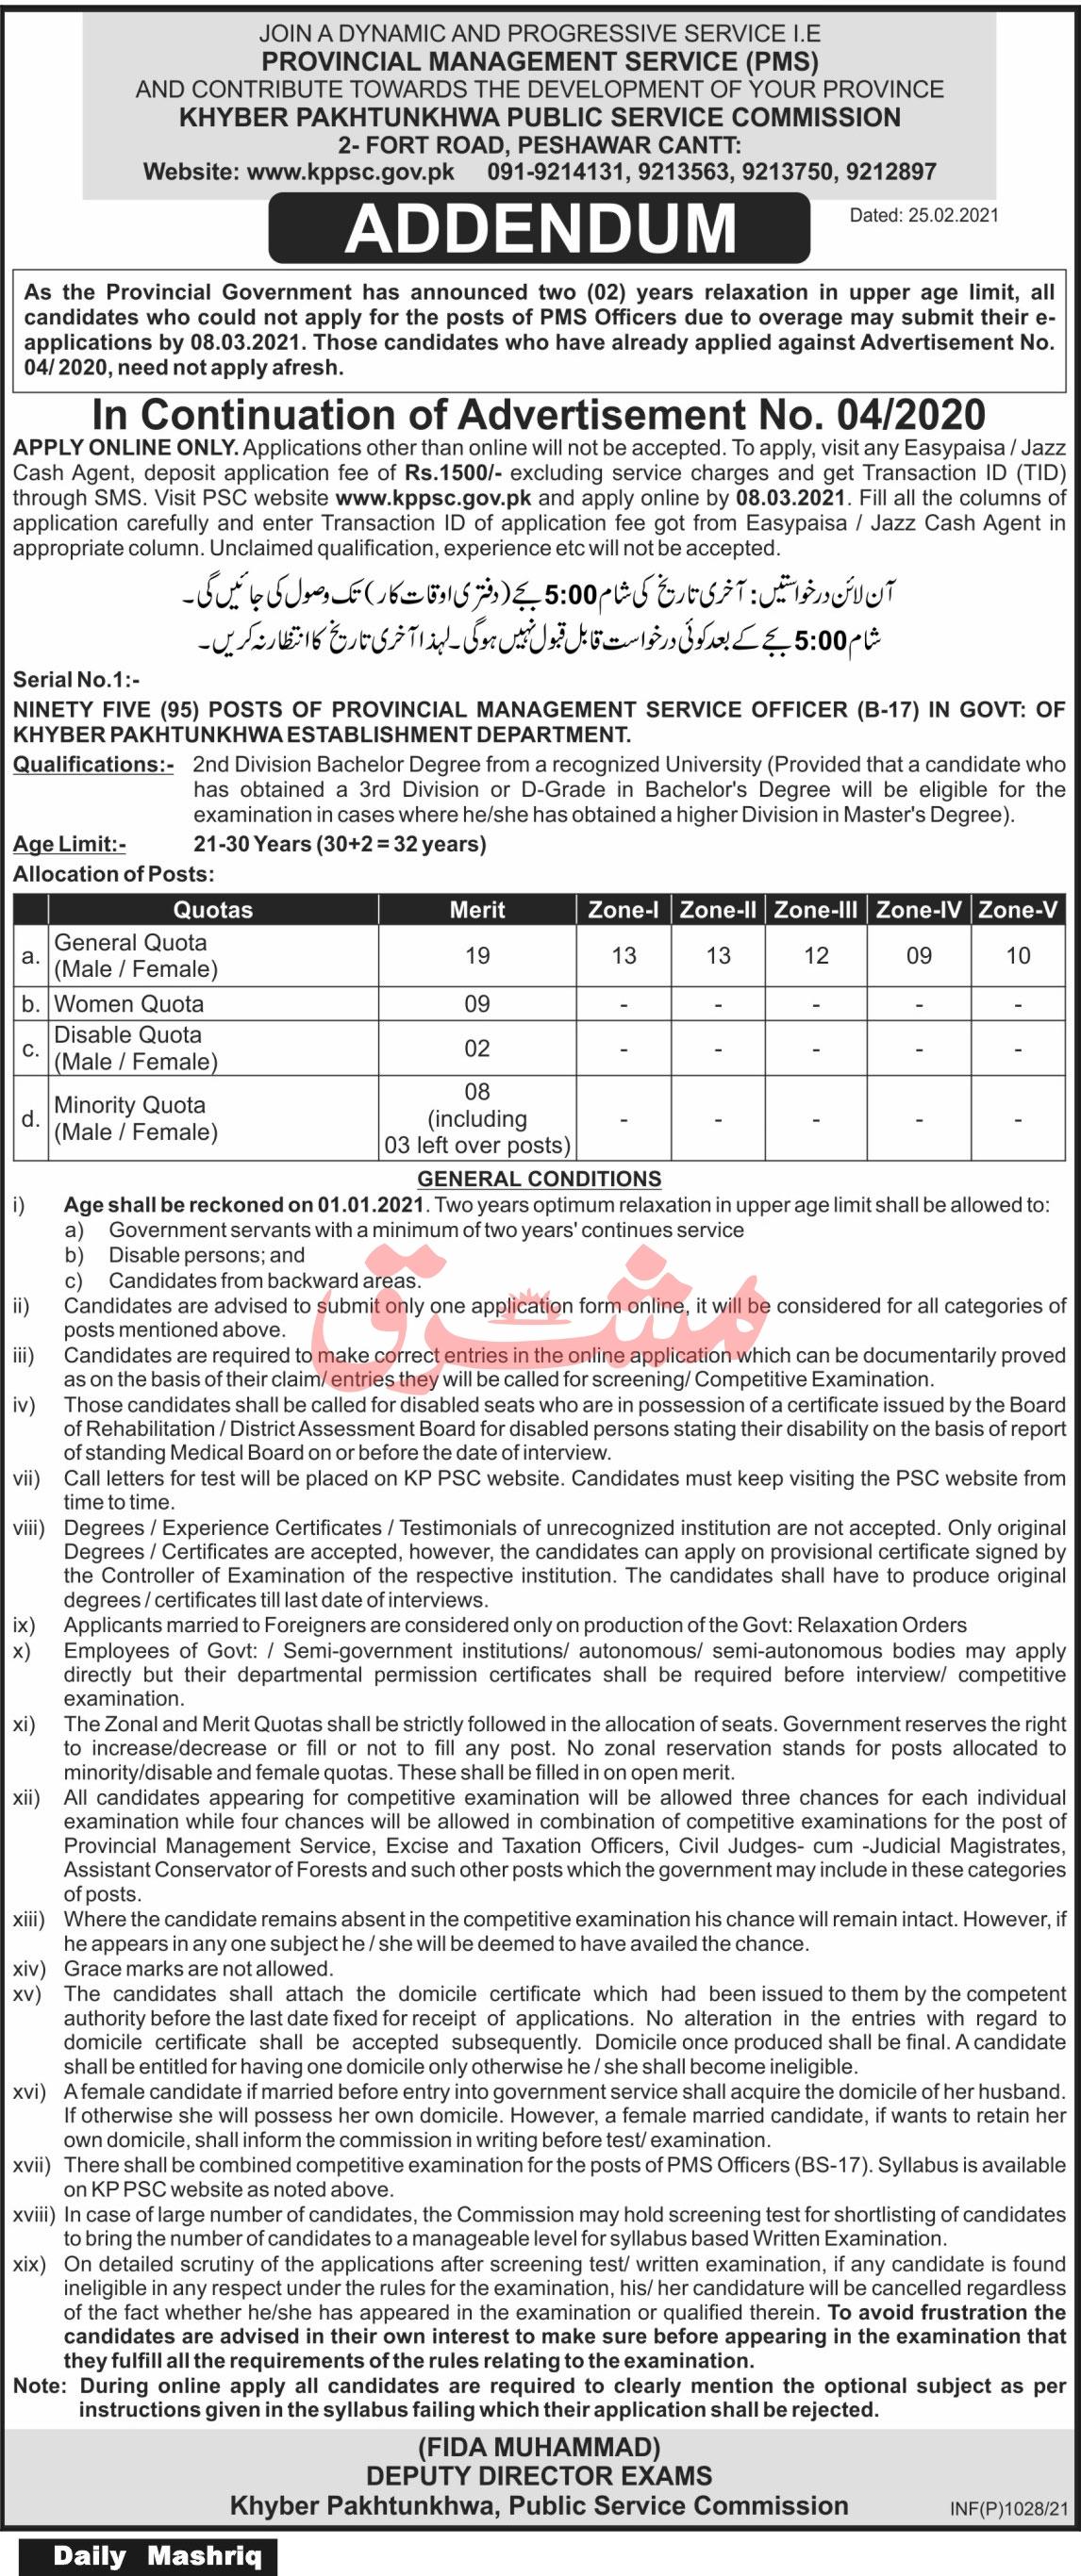 Download KPPSC Jobs 2021 Application Form :- www.kppsc.gov.pk - Khyber Pakhtunkhwa Public Service Commission Jobs 2021 in Pakistan - PMS Officer Jobs 2021